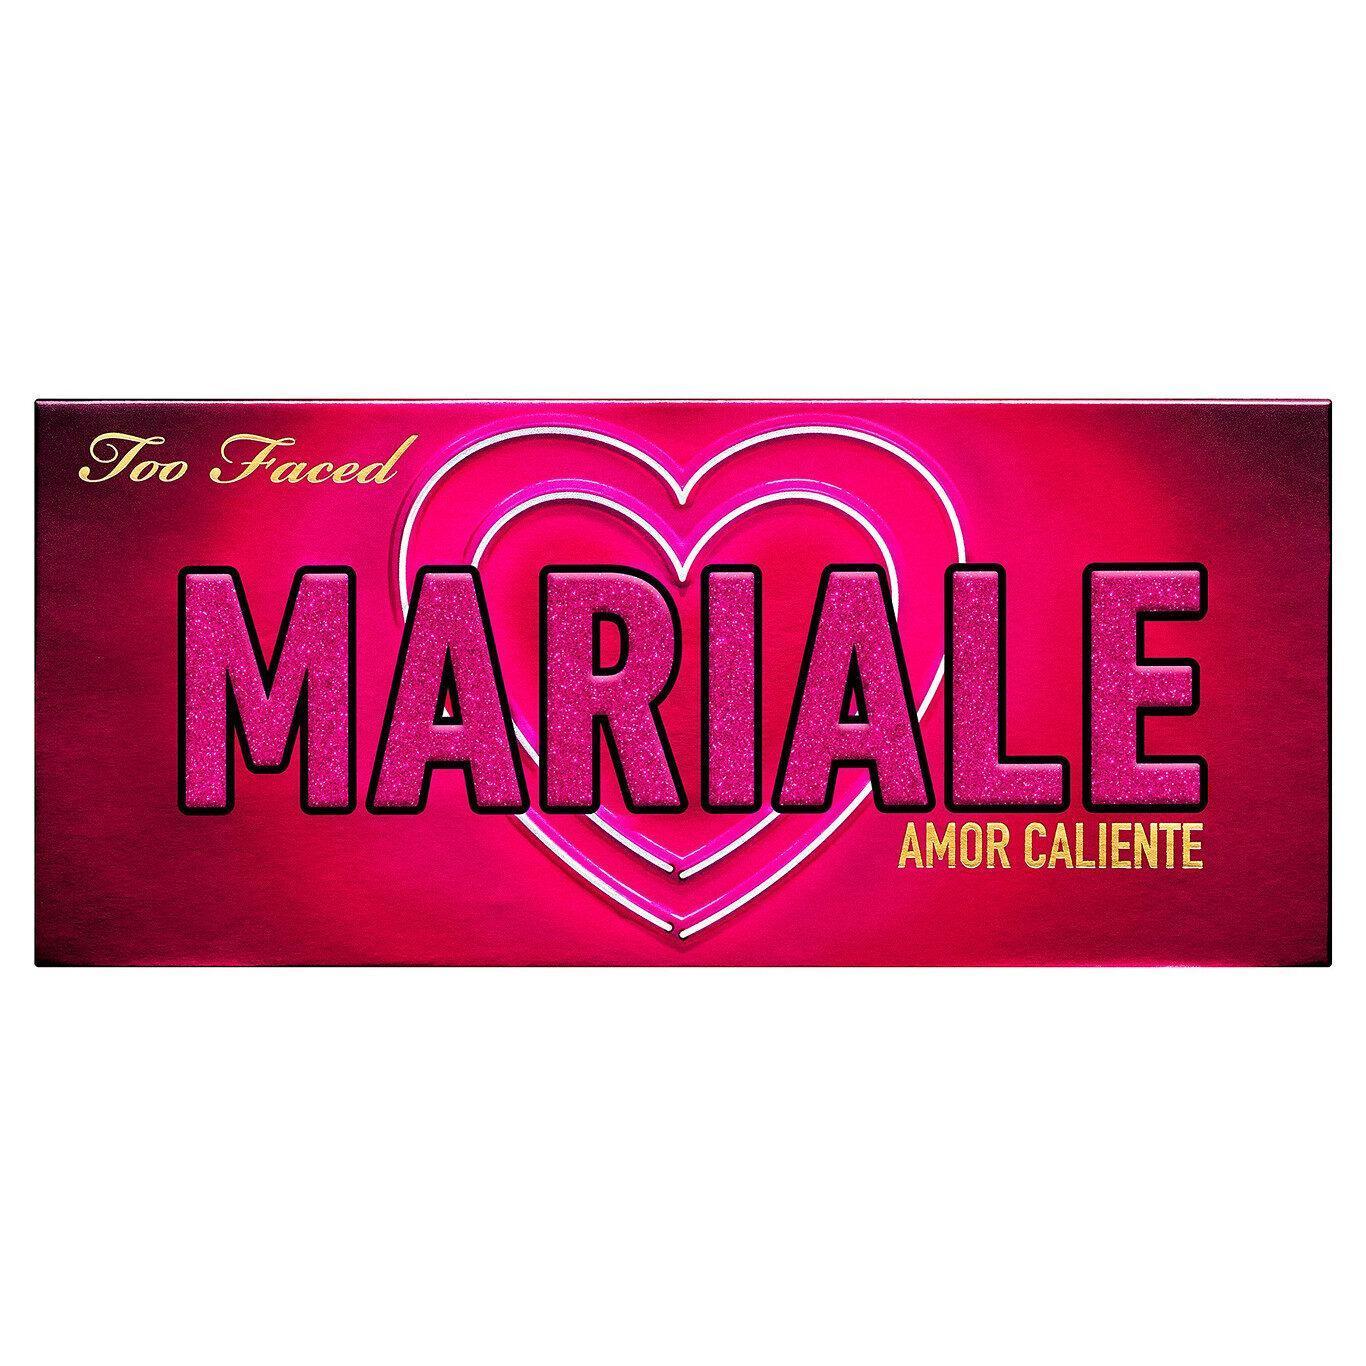 Too Faced x Mariale (Amor Caliente) Semi Closed